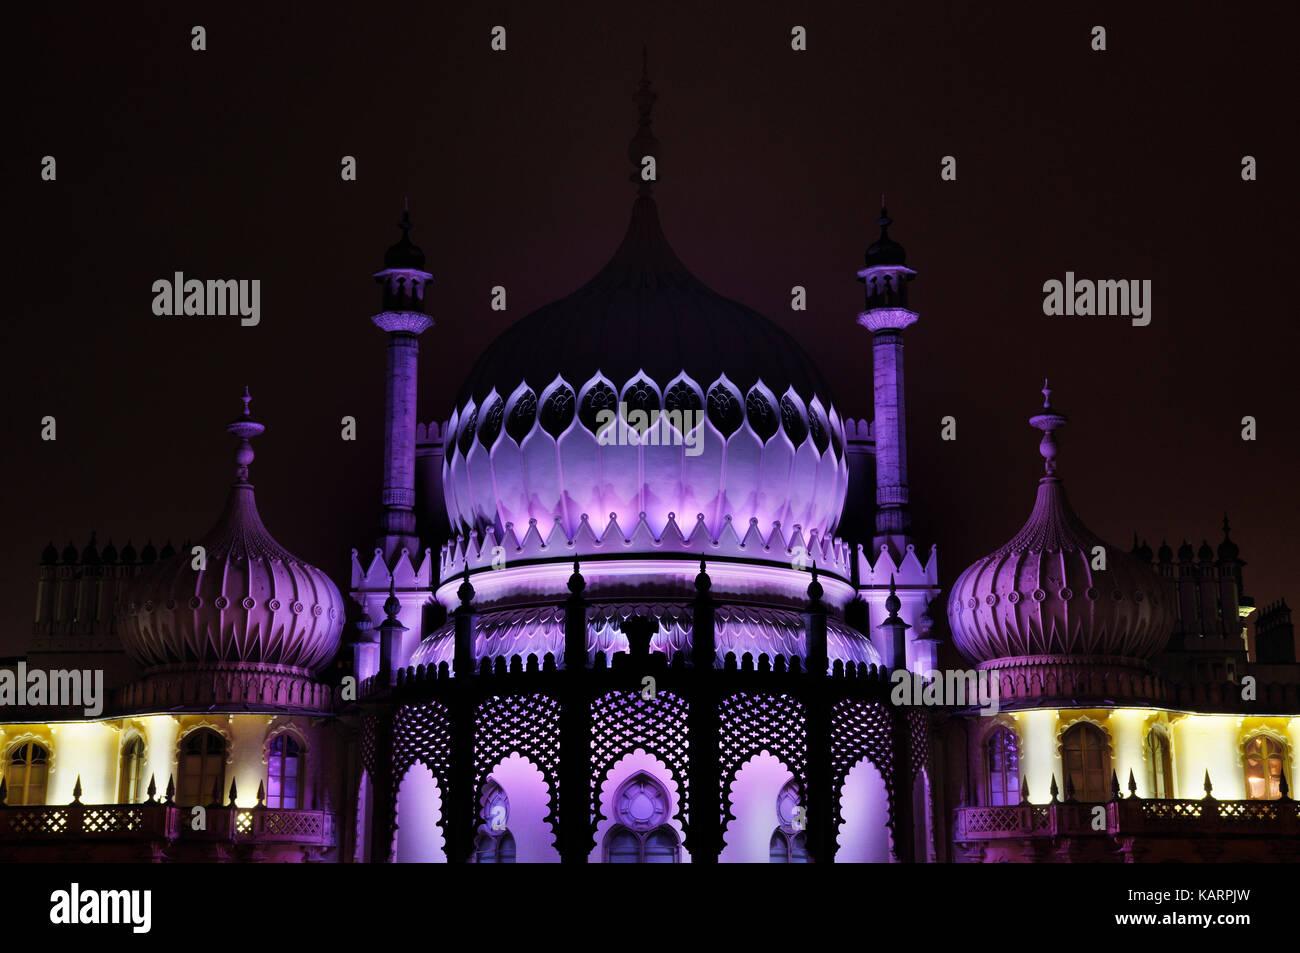 Brighton Royal Pavilion bei Nacht, East Sussex, England, Großbritannien Stockbild